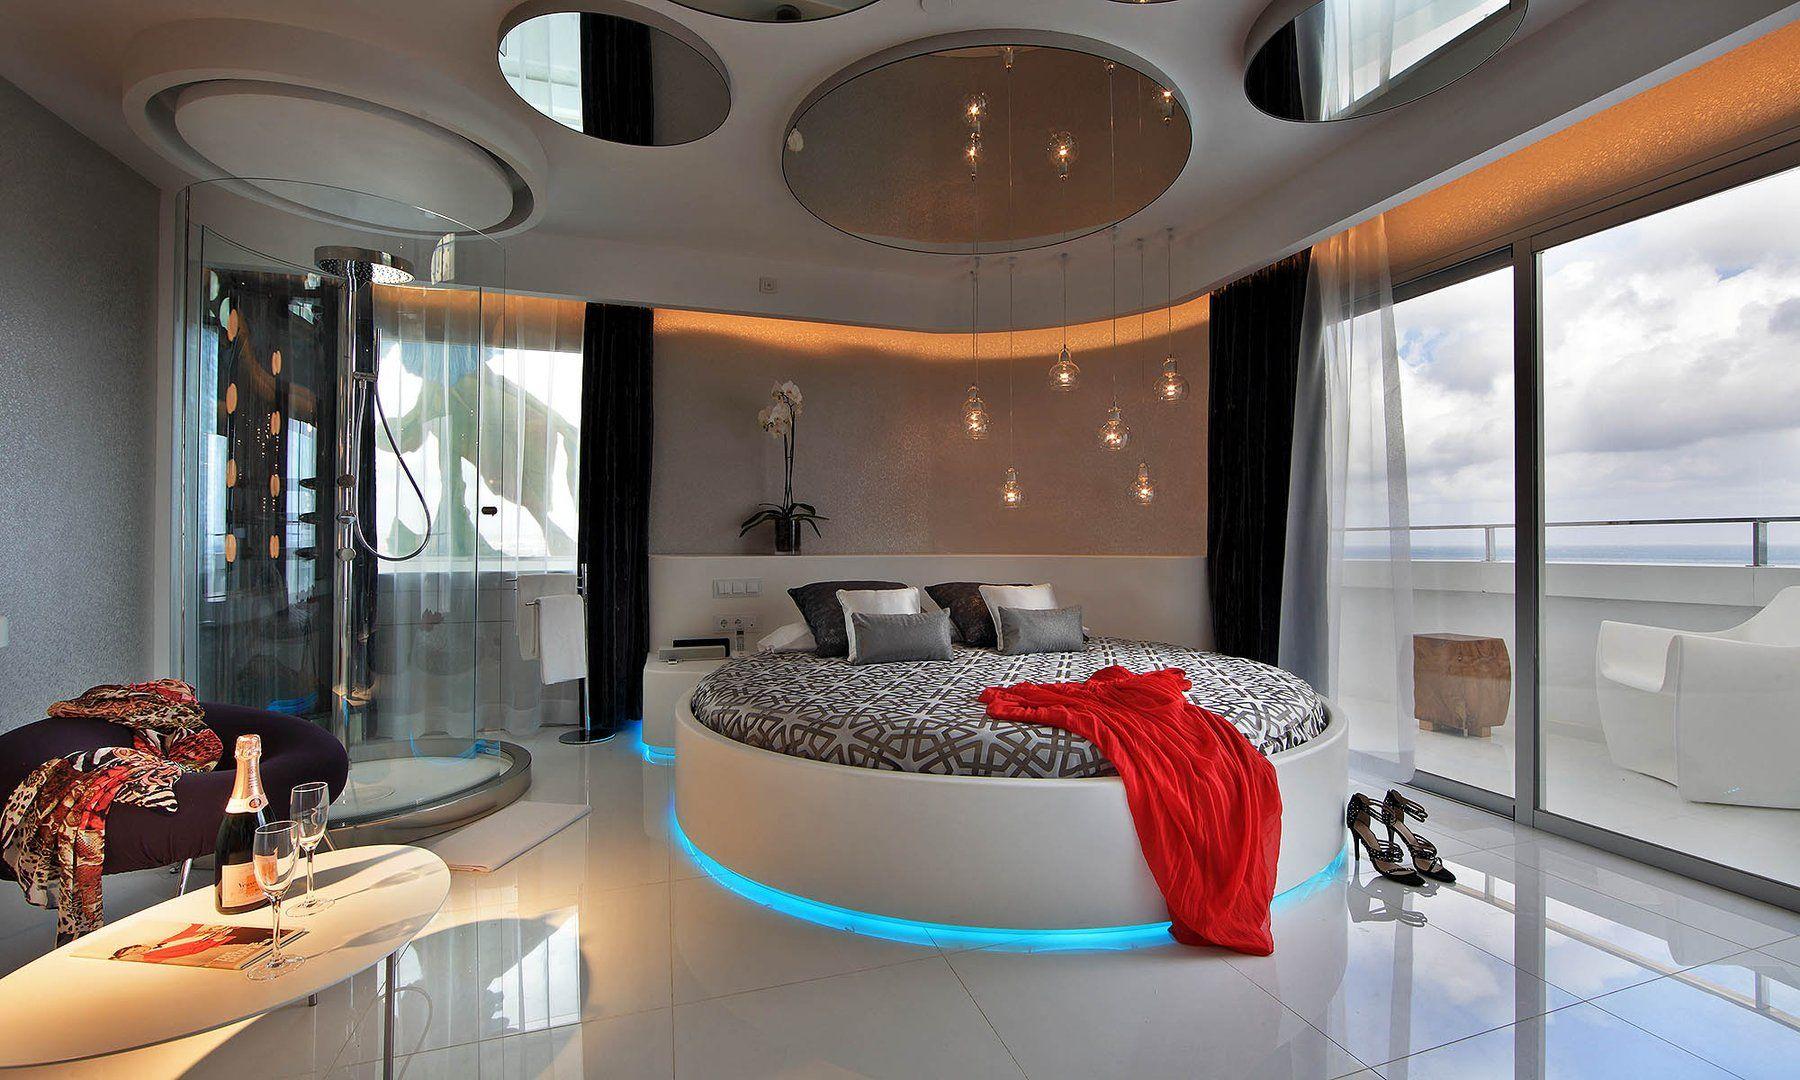 Ushuaia beach hotel the official web site motivation for Design hotel ibiza